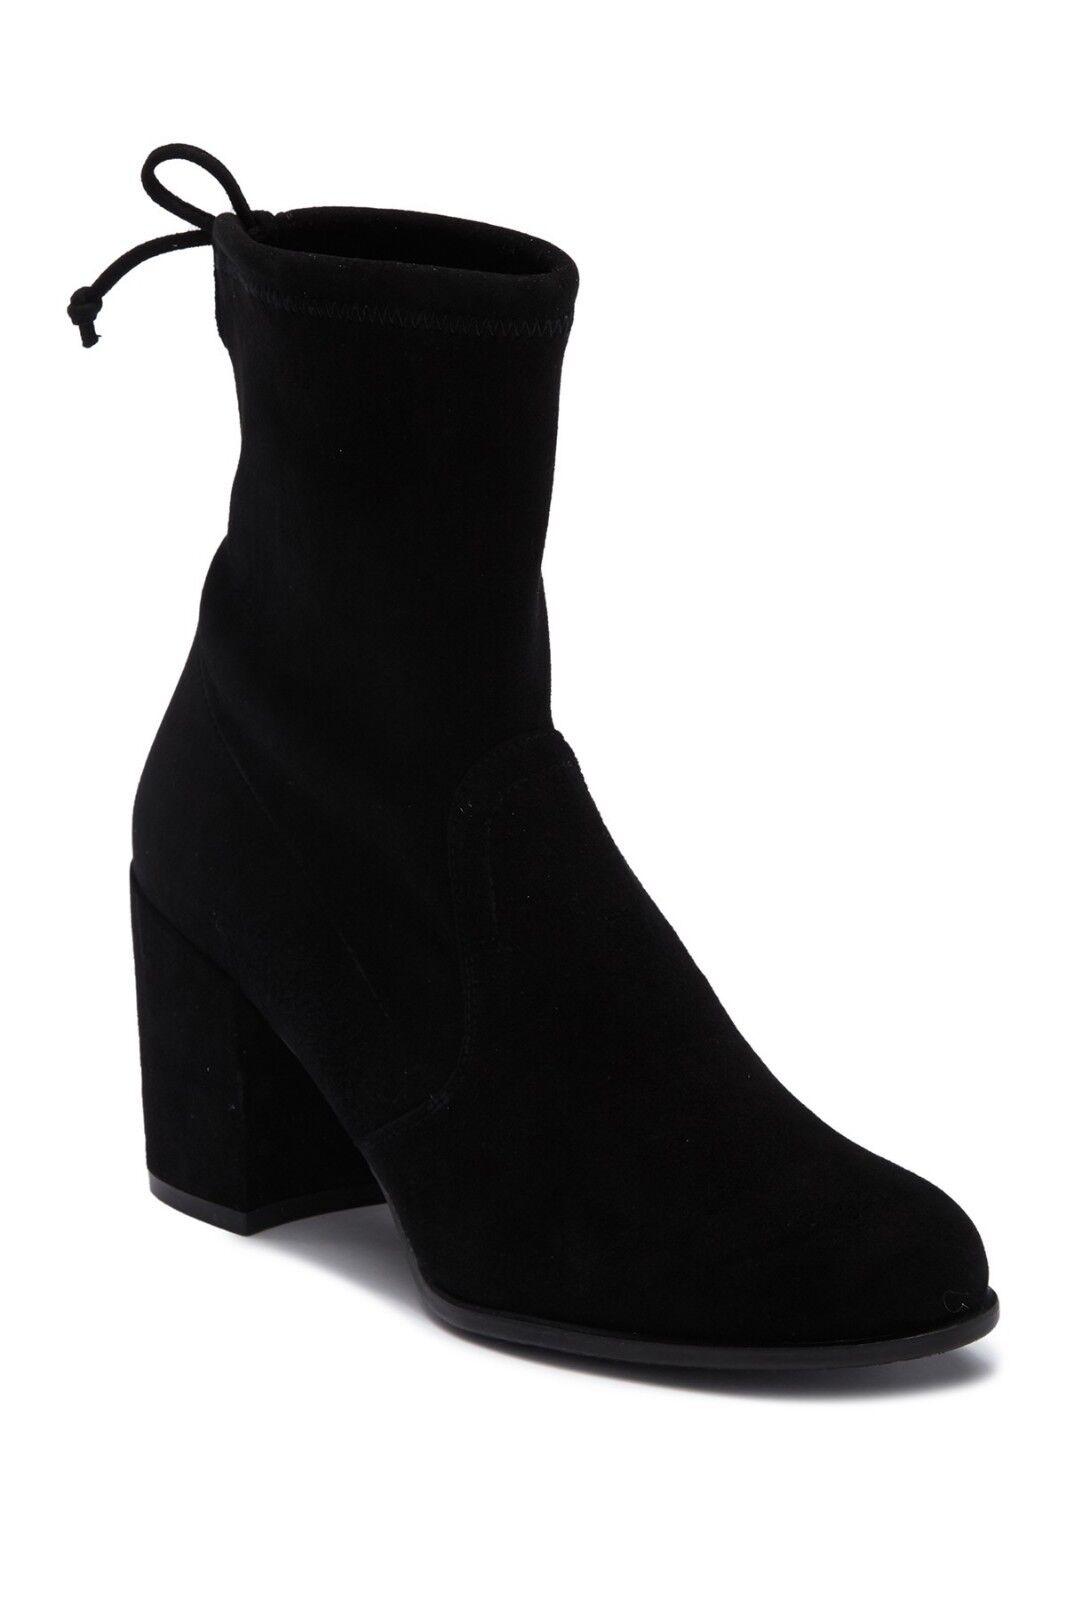 vendita calda New Stuart Weitzman Shorty Block Block Block Heel avvio nero Suede Dimensione 7.5  comprare sconti